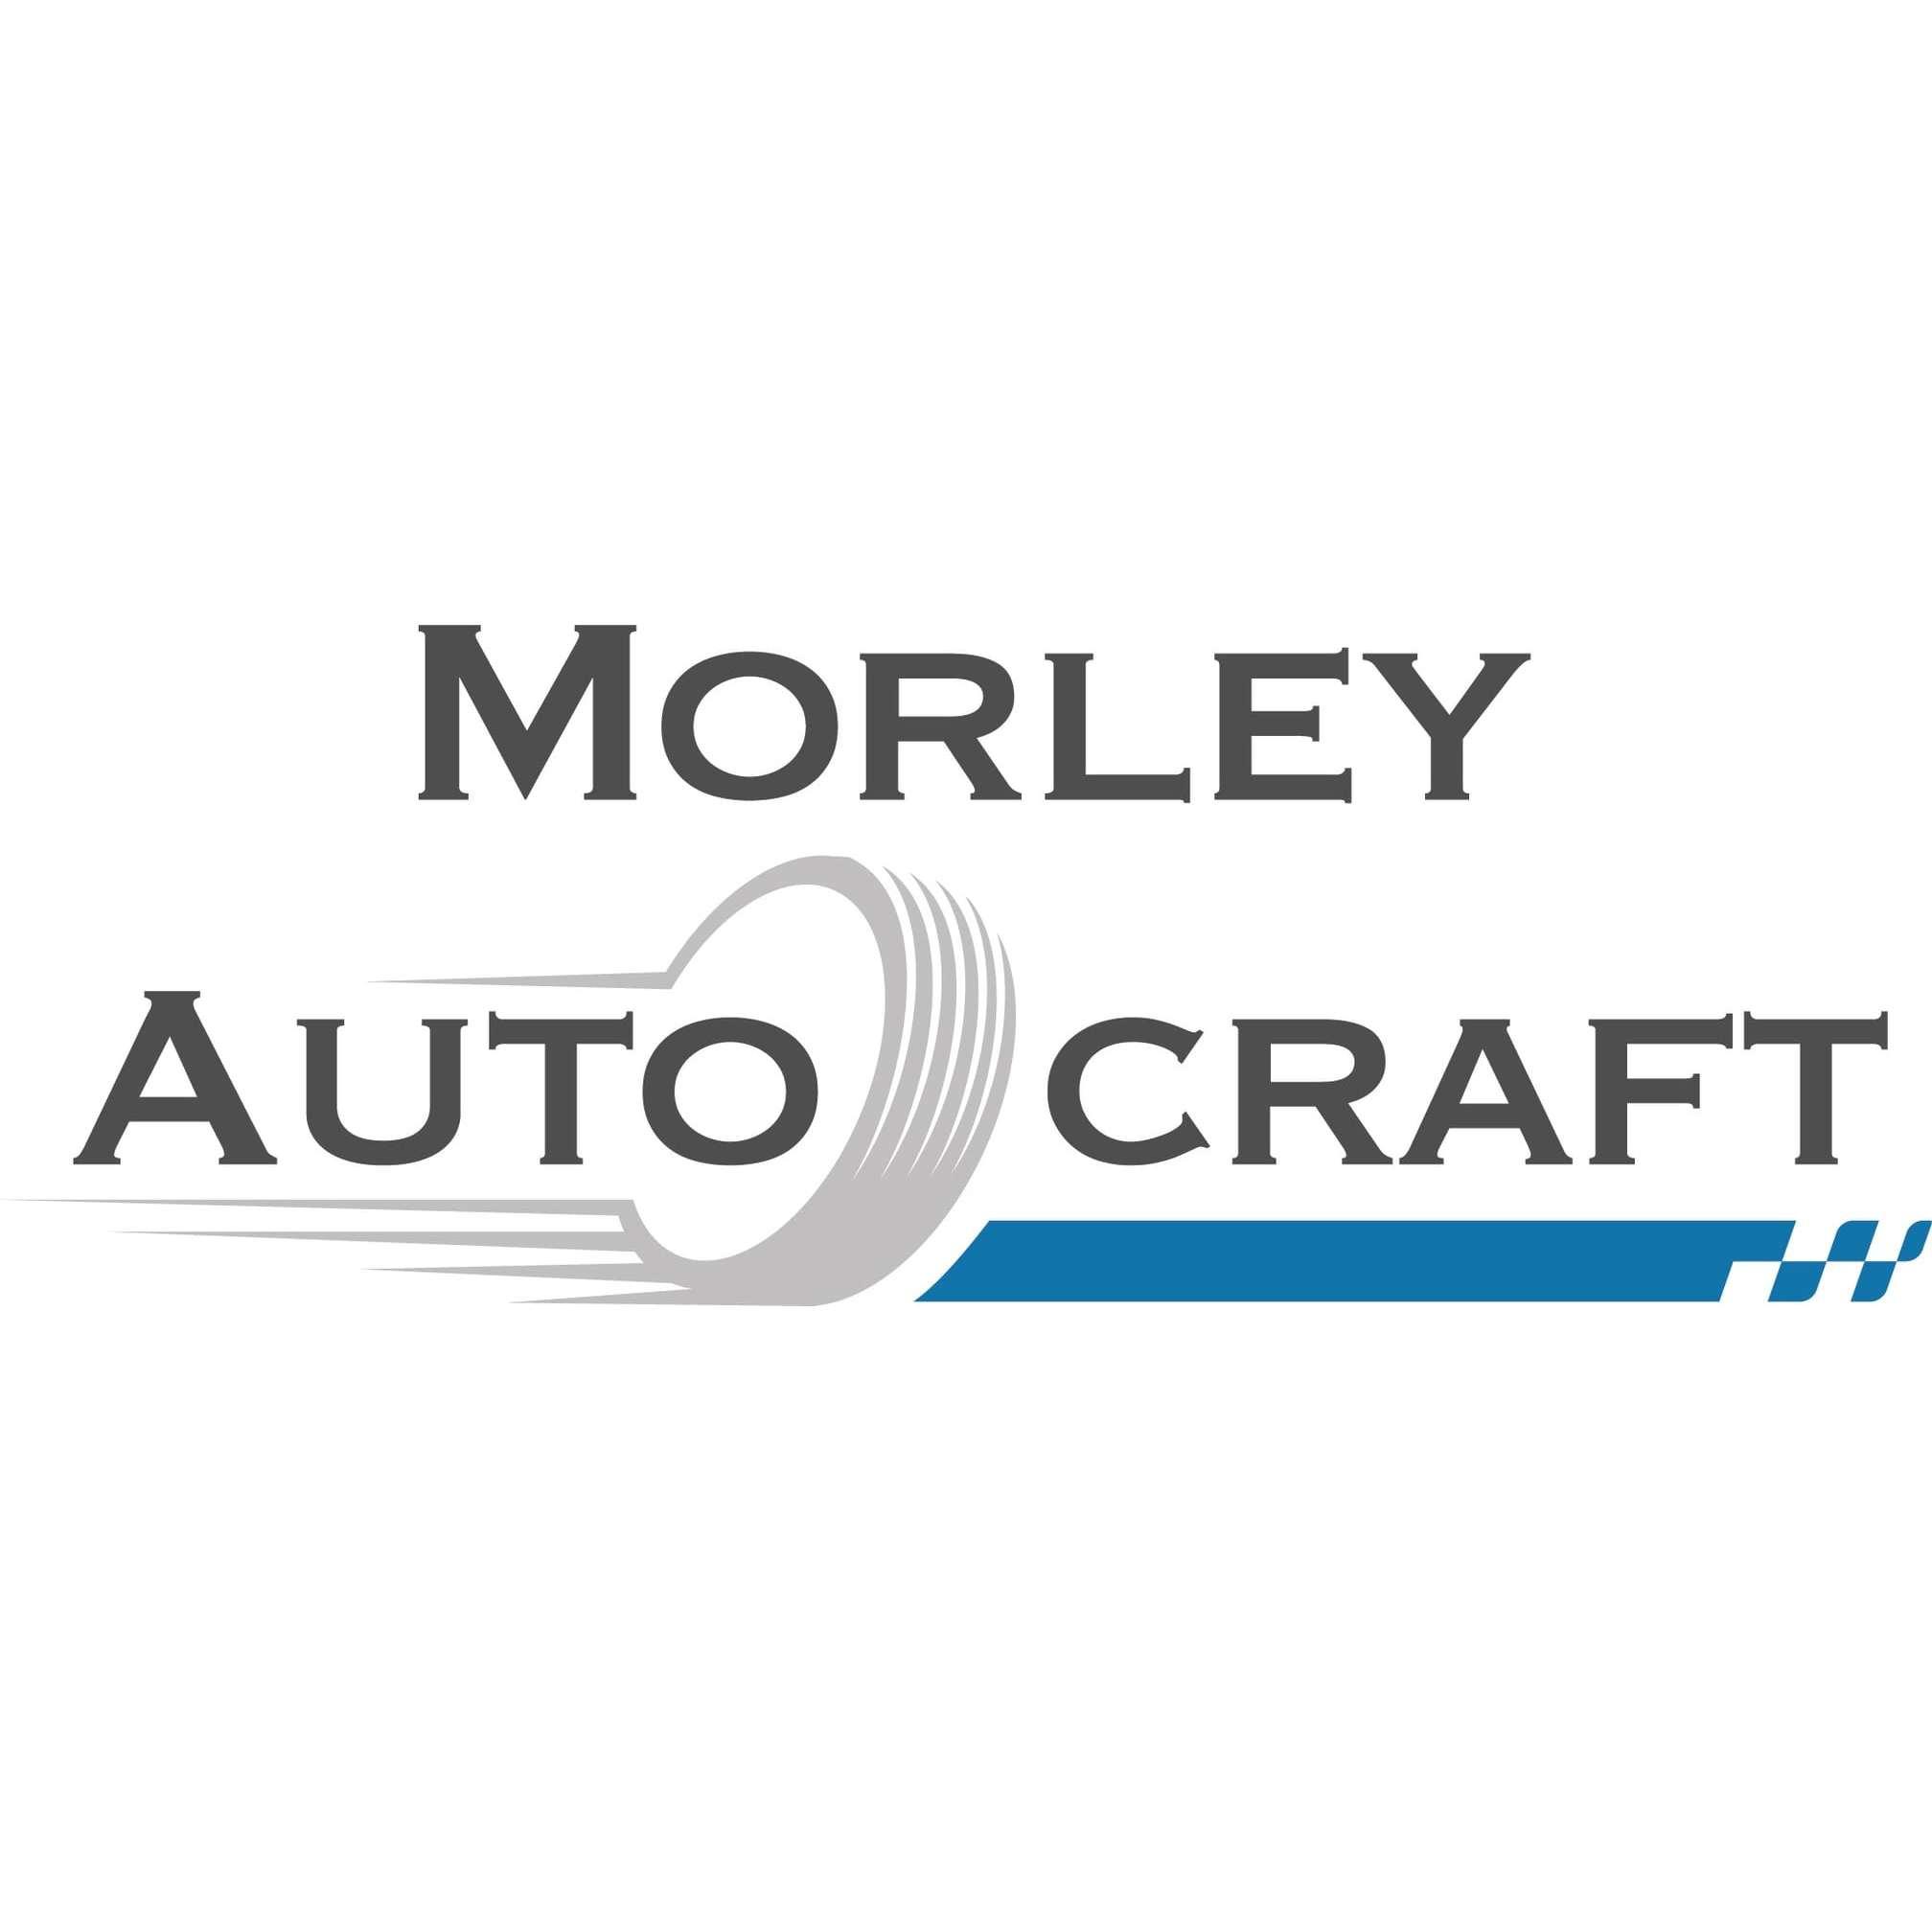 Morley Autocraft - Leeds, West Yorkshire LS27 0FD - 01134 684999 | ShowMeLocal.com